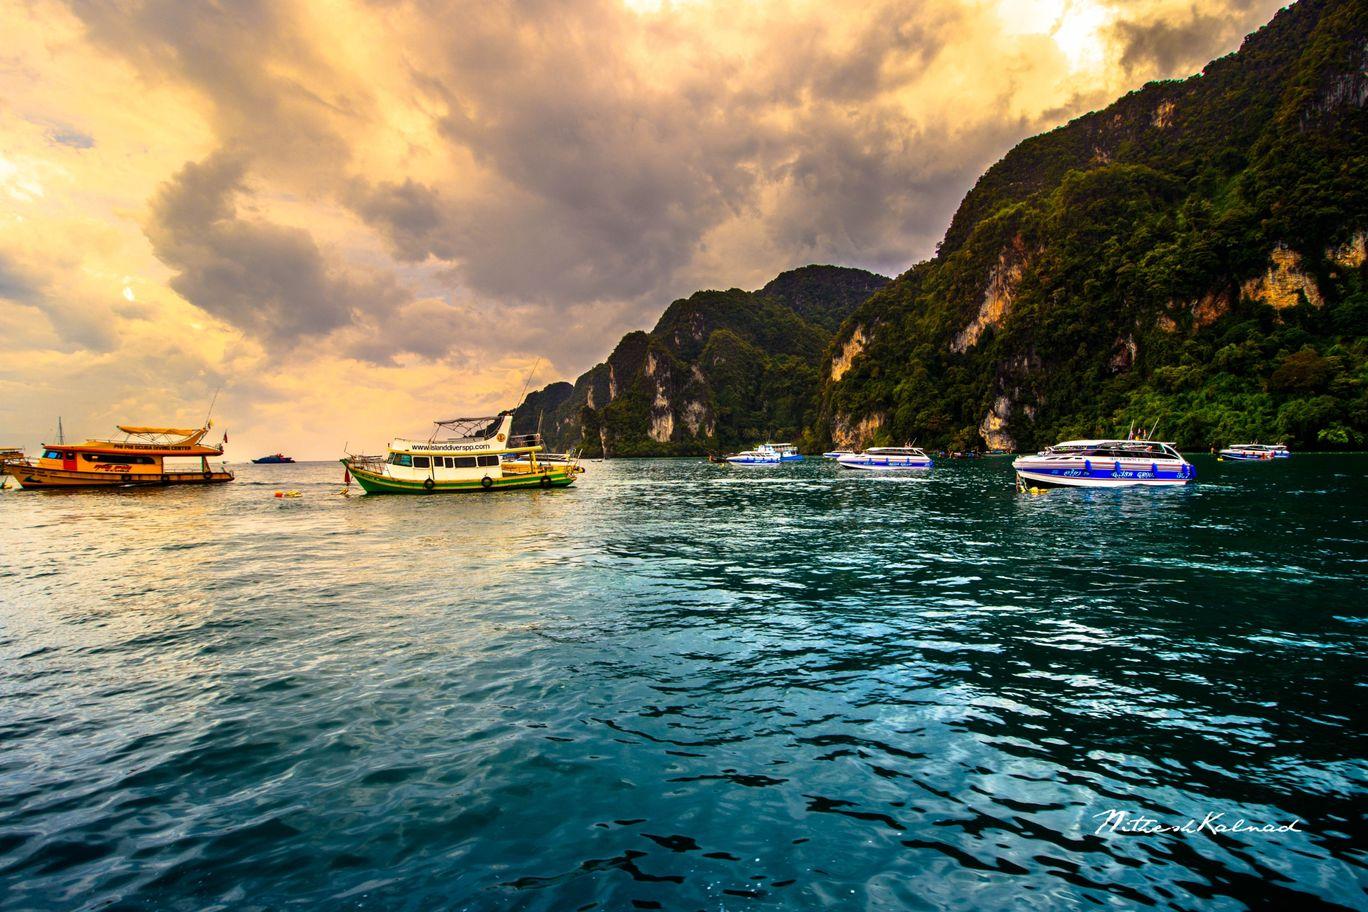 Photo of Thailand By nitheshkalnad